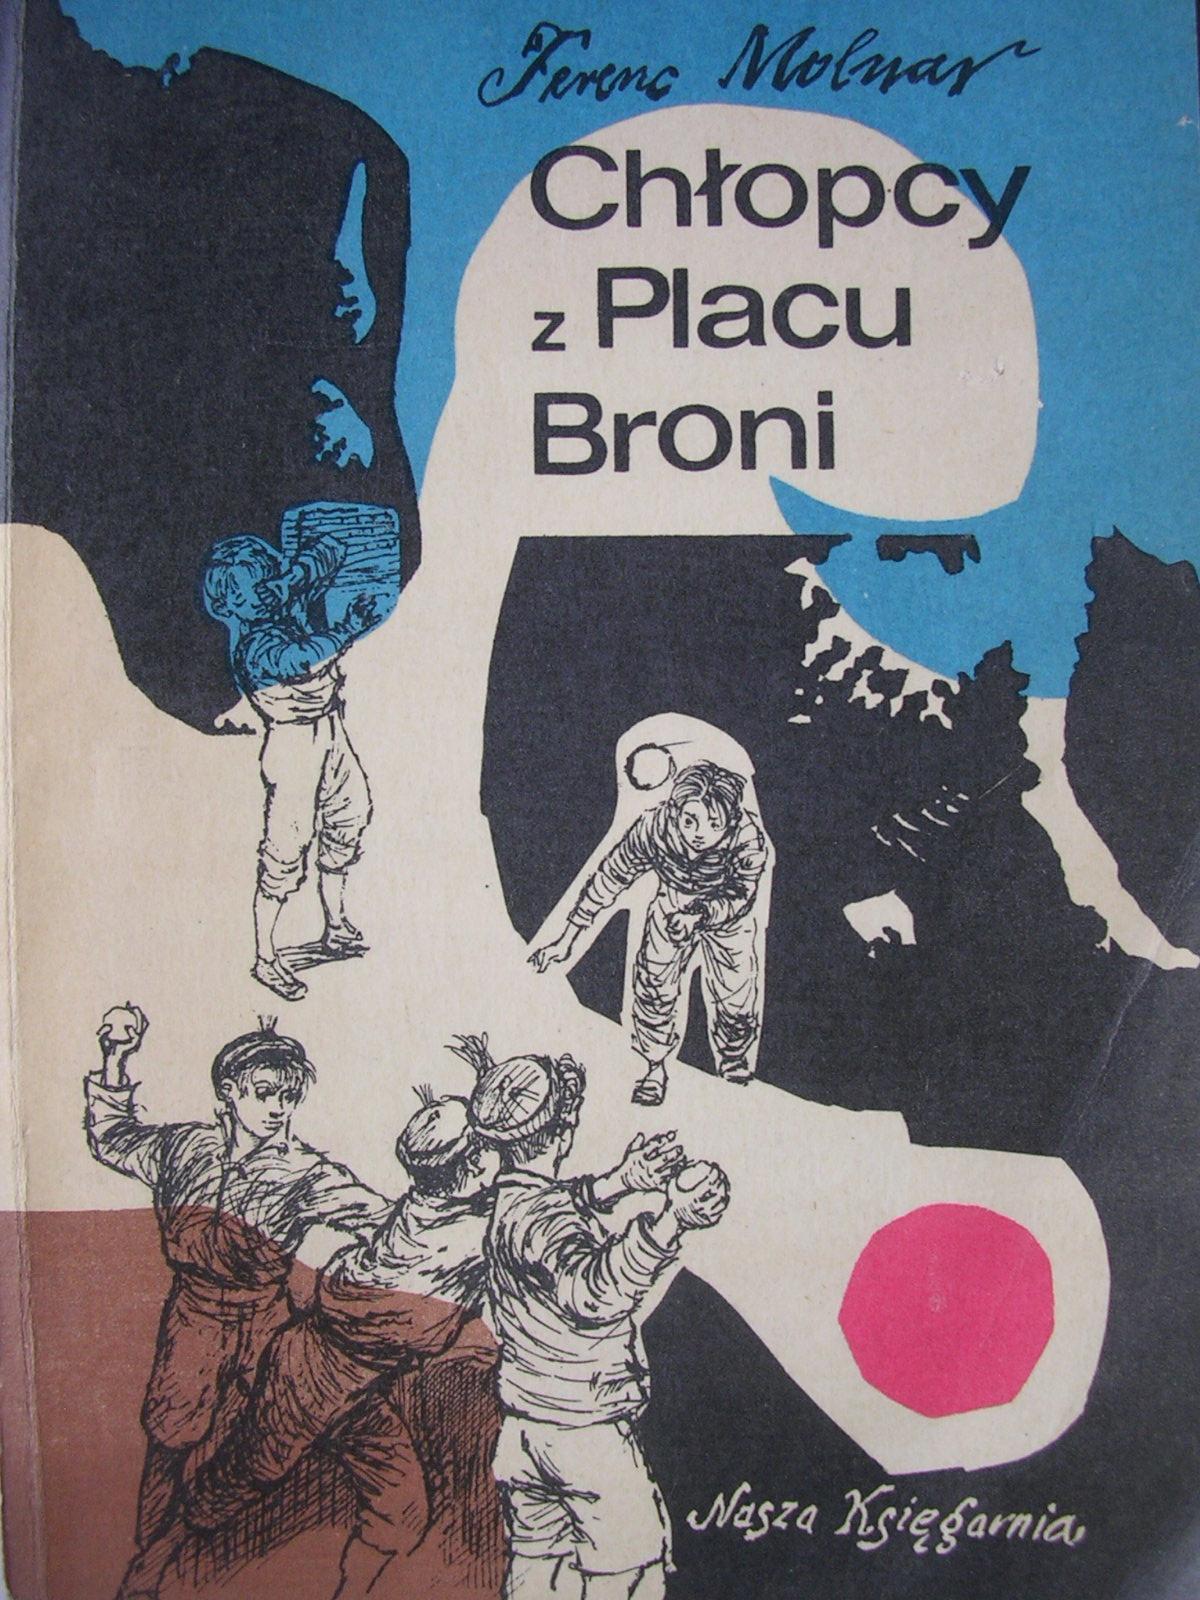 Chłopcy z placu broni - Ferenc Molnar DB